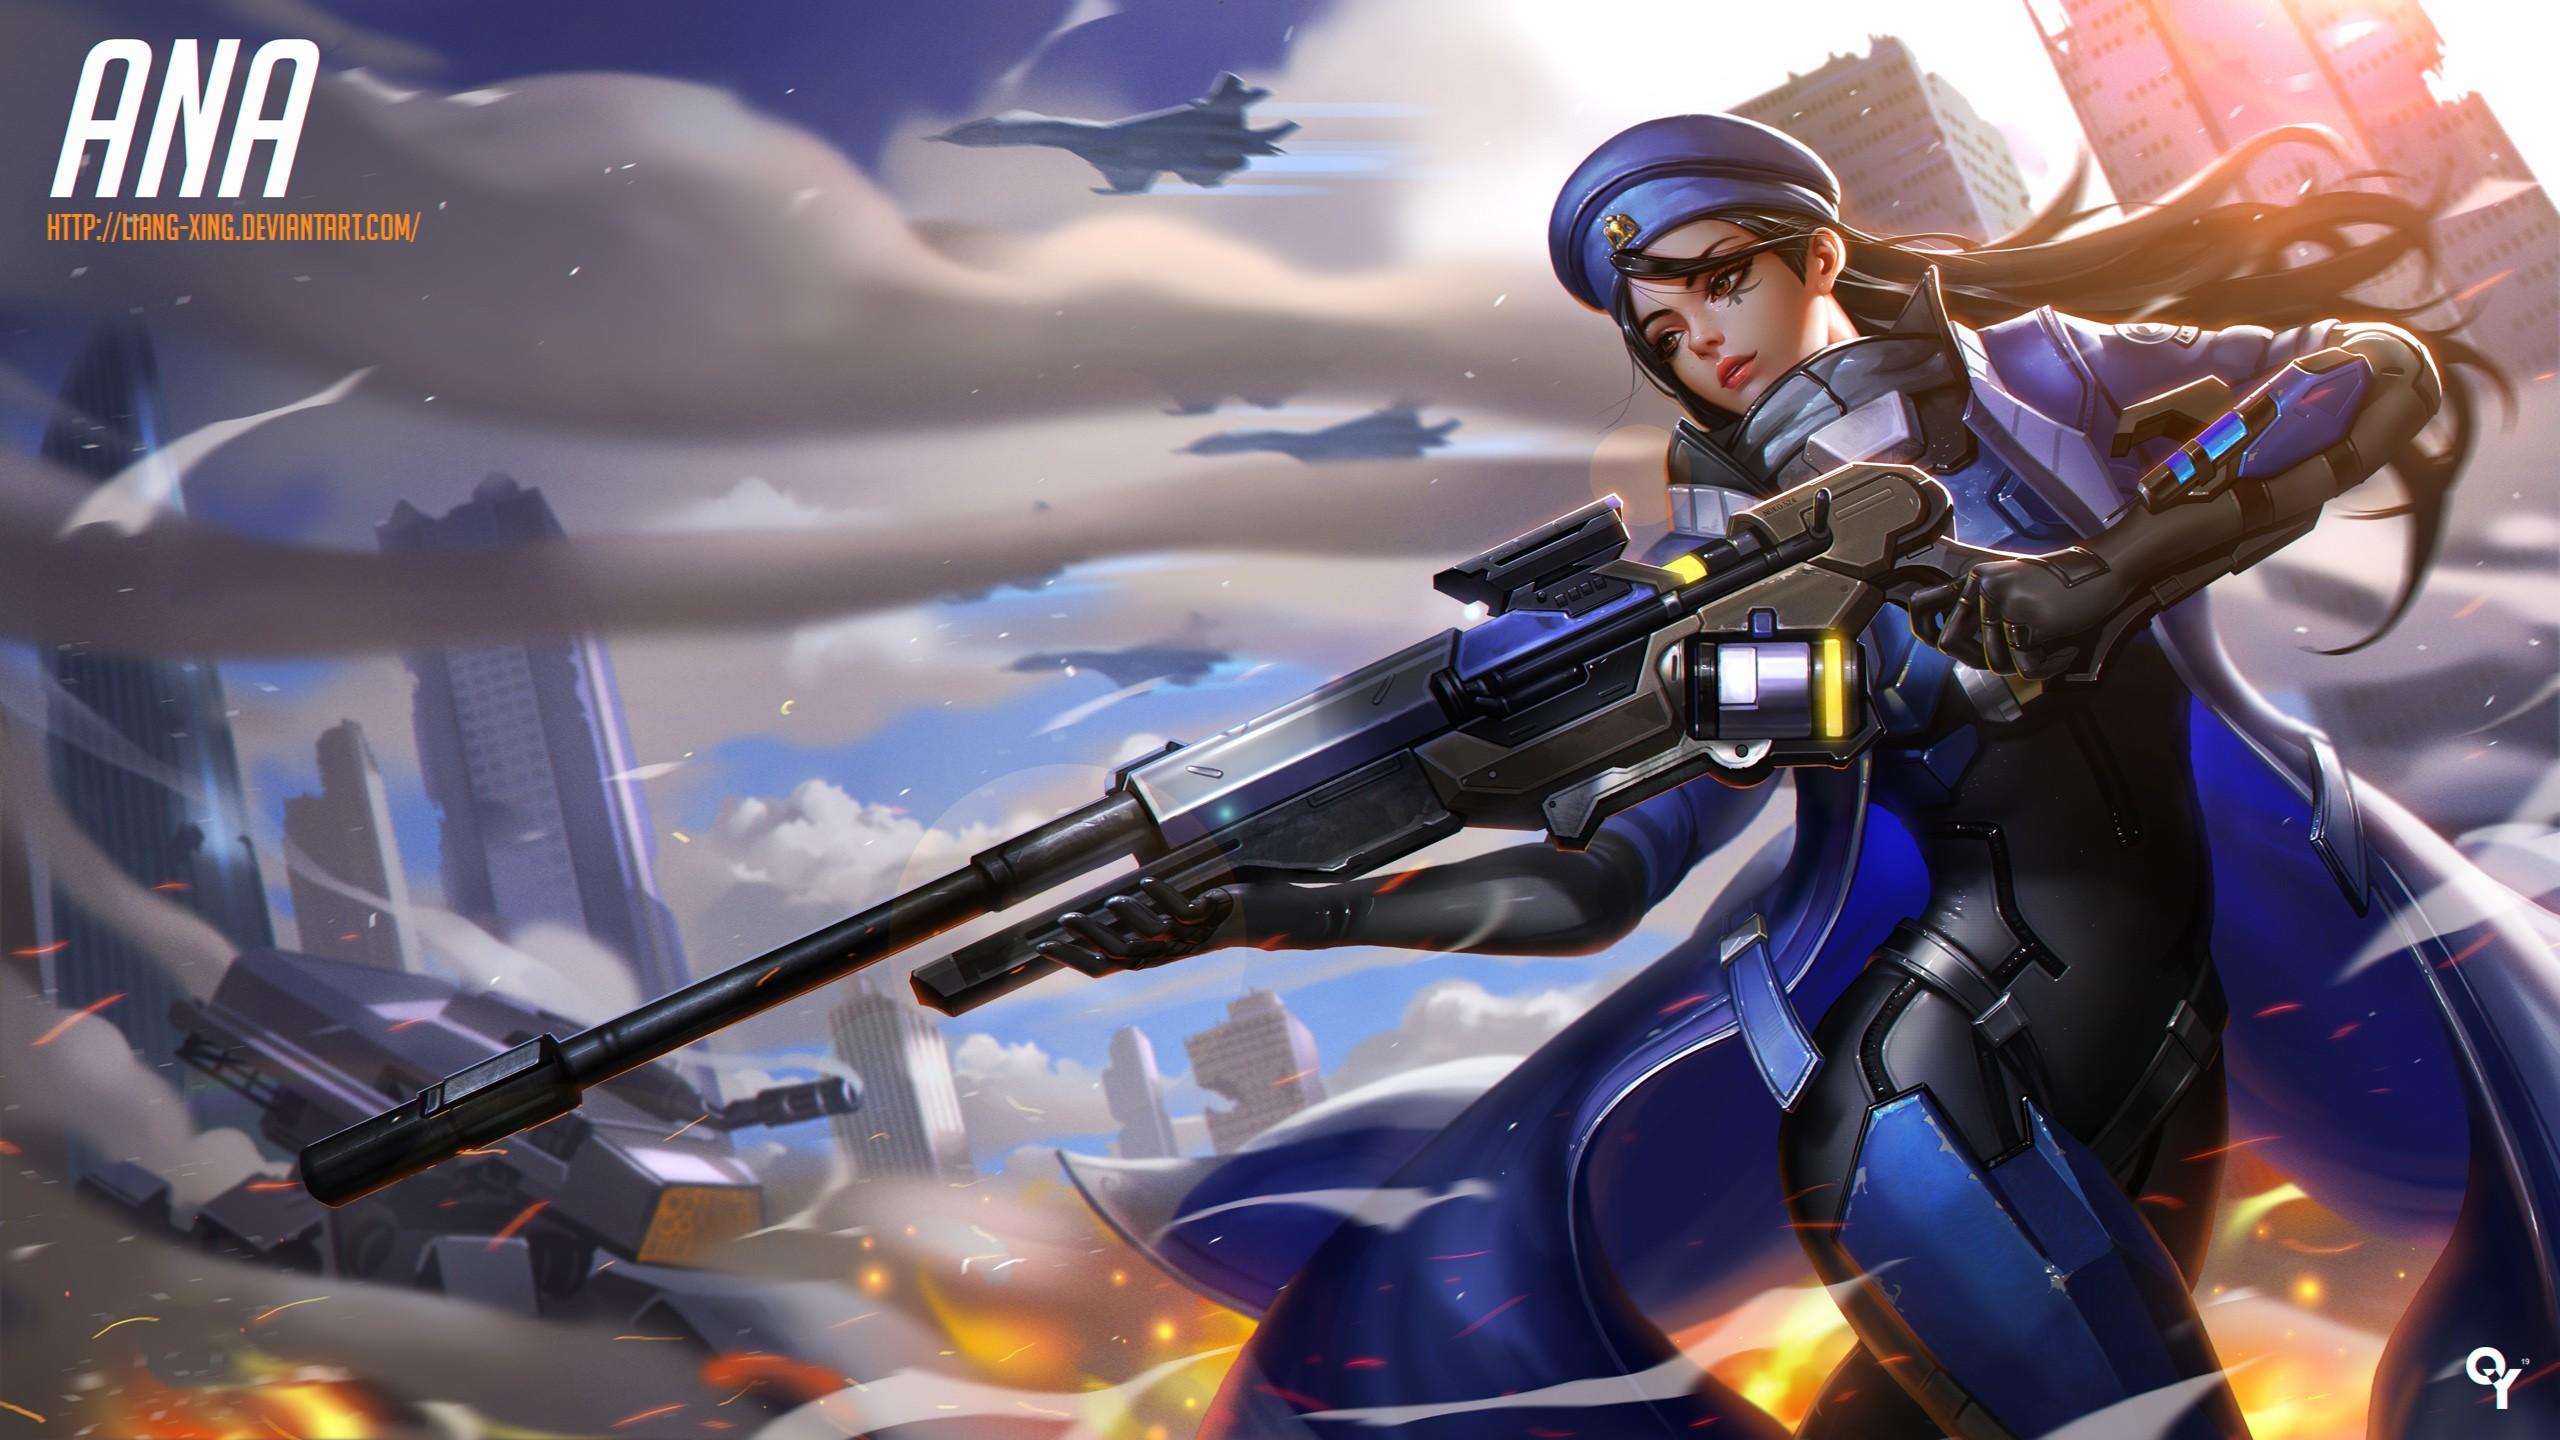 Anime 2560x1440 anime anime girls Overwatch Ana (Overwatch) bodysuit gun sniper rifle tattoo long hair